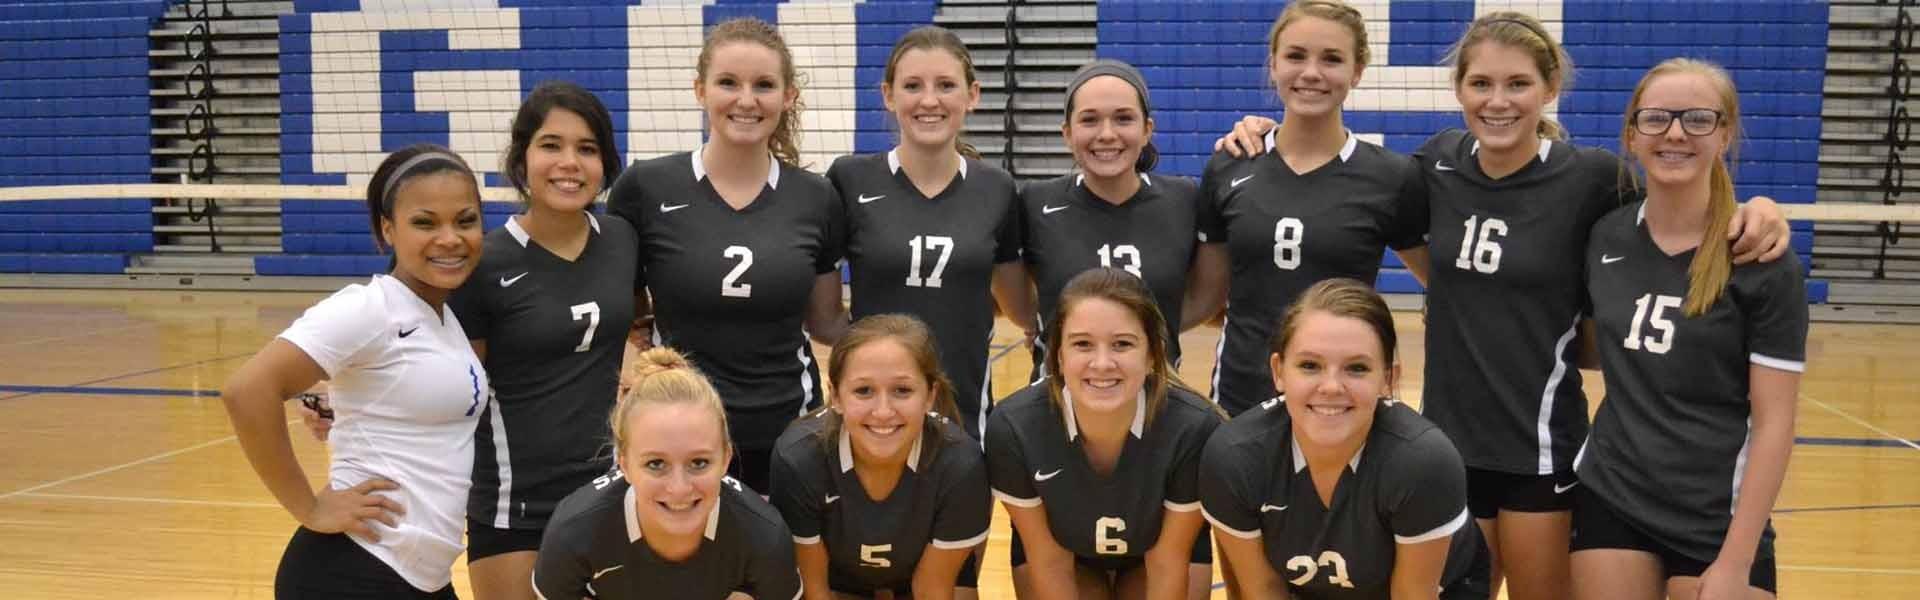 Henrycounty-Highschool-GA-Volleyball-Banner-Main-US-2019